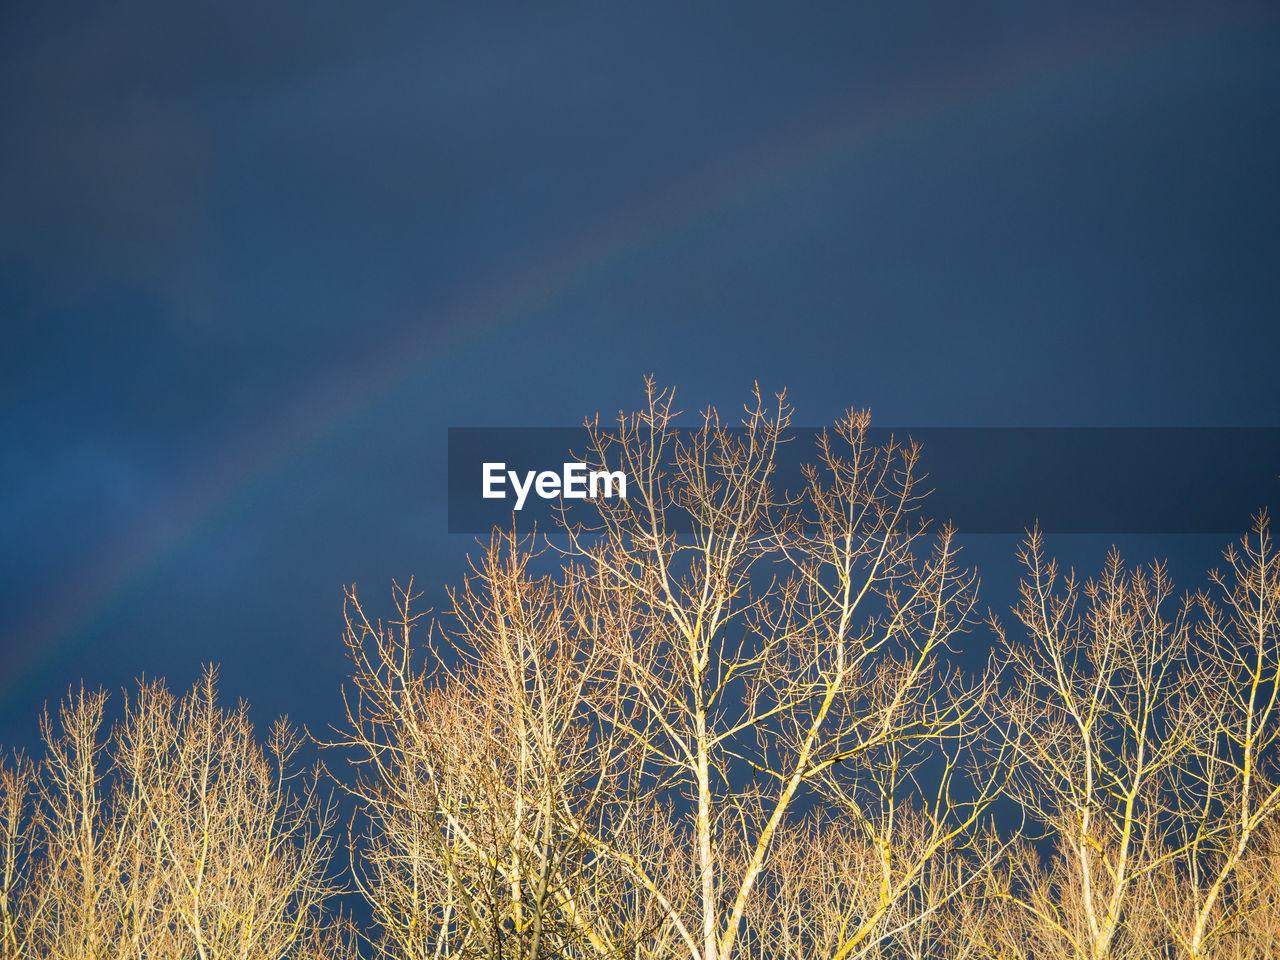 Rainbow over bare trees and dark sky in autumn